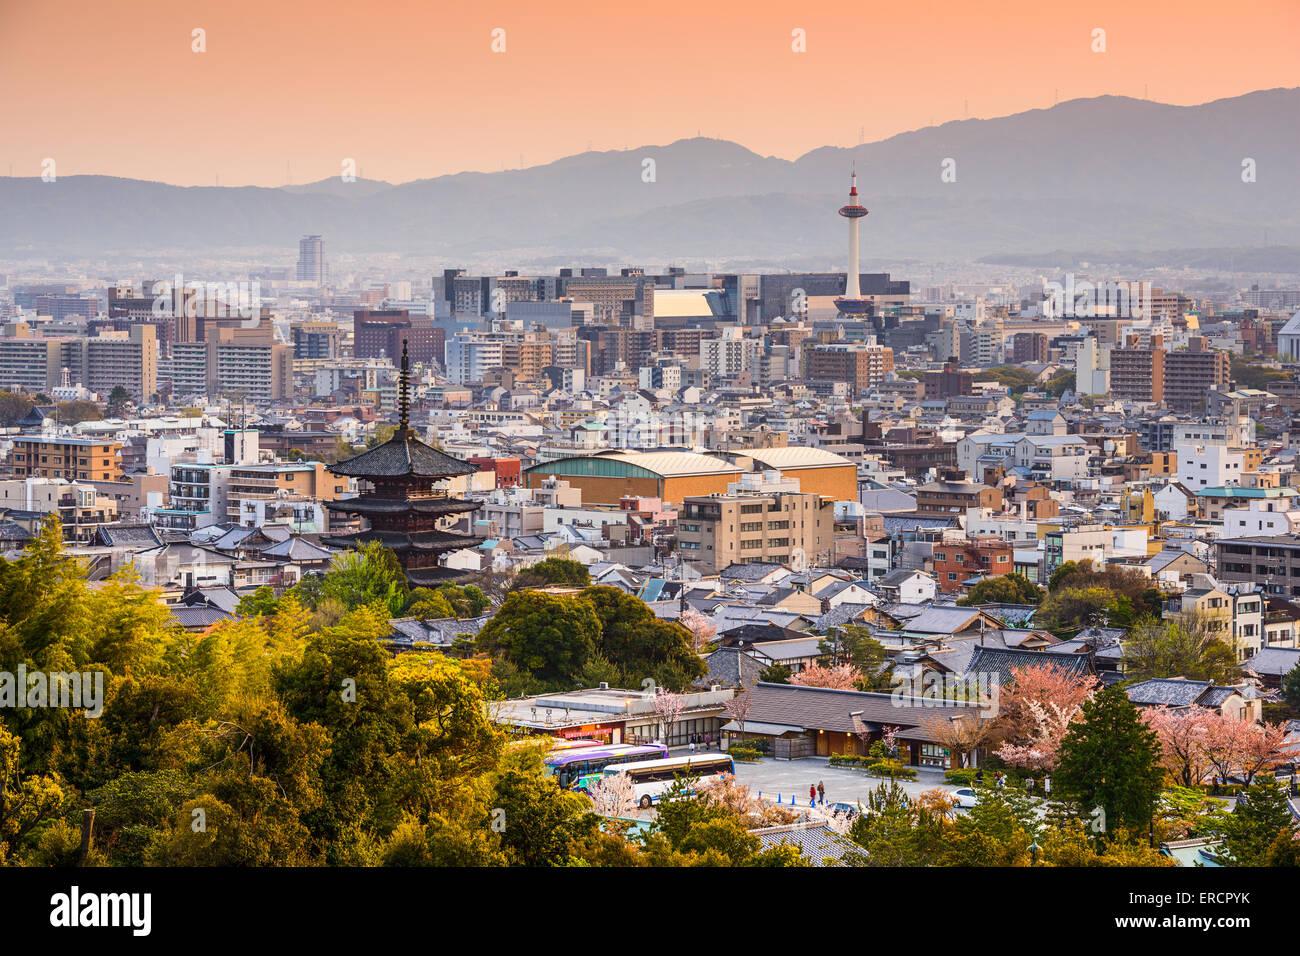 Kyoto, Japan Stadt Skyline in der Abenddämmerung. Stockbild